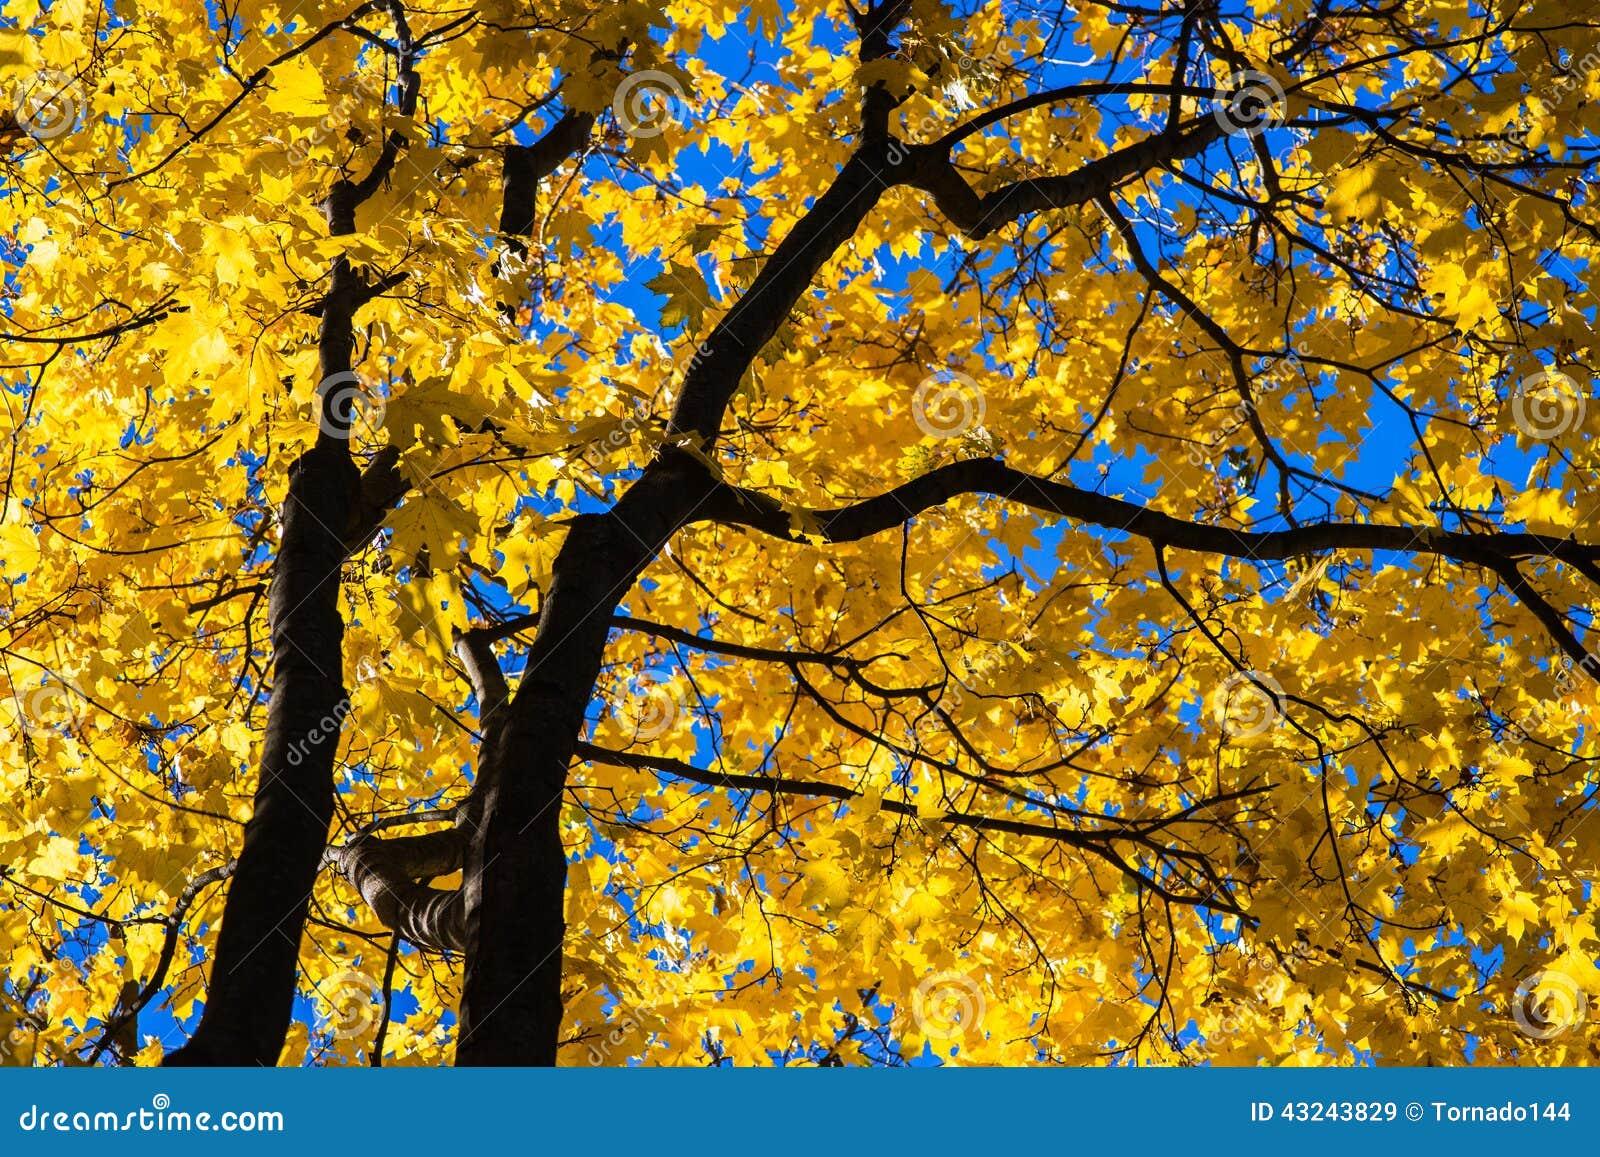 October Blues 7 Stock Image Image Of Foliage Environment